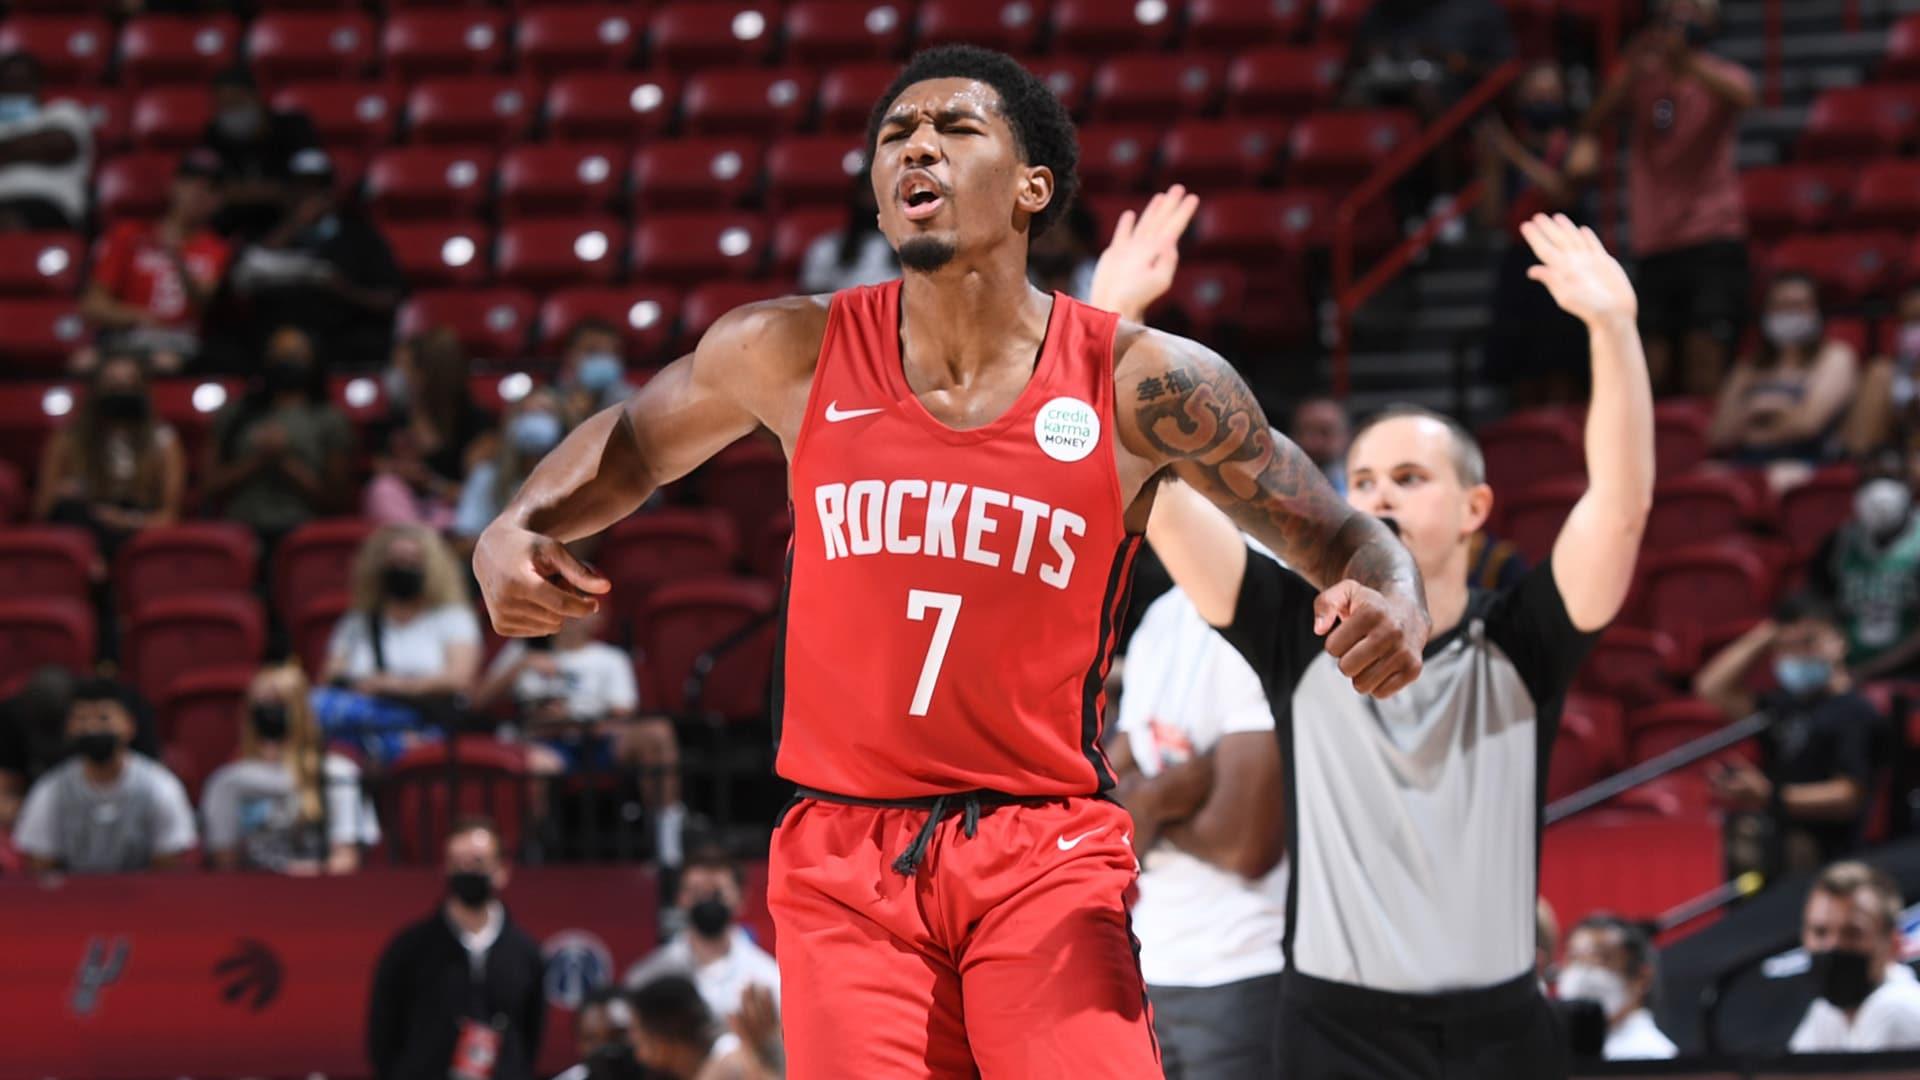 Las Vegas Summer League: Rockets use big 4th quarter to drop Blazers